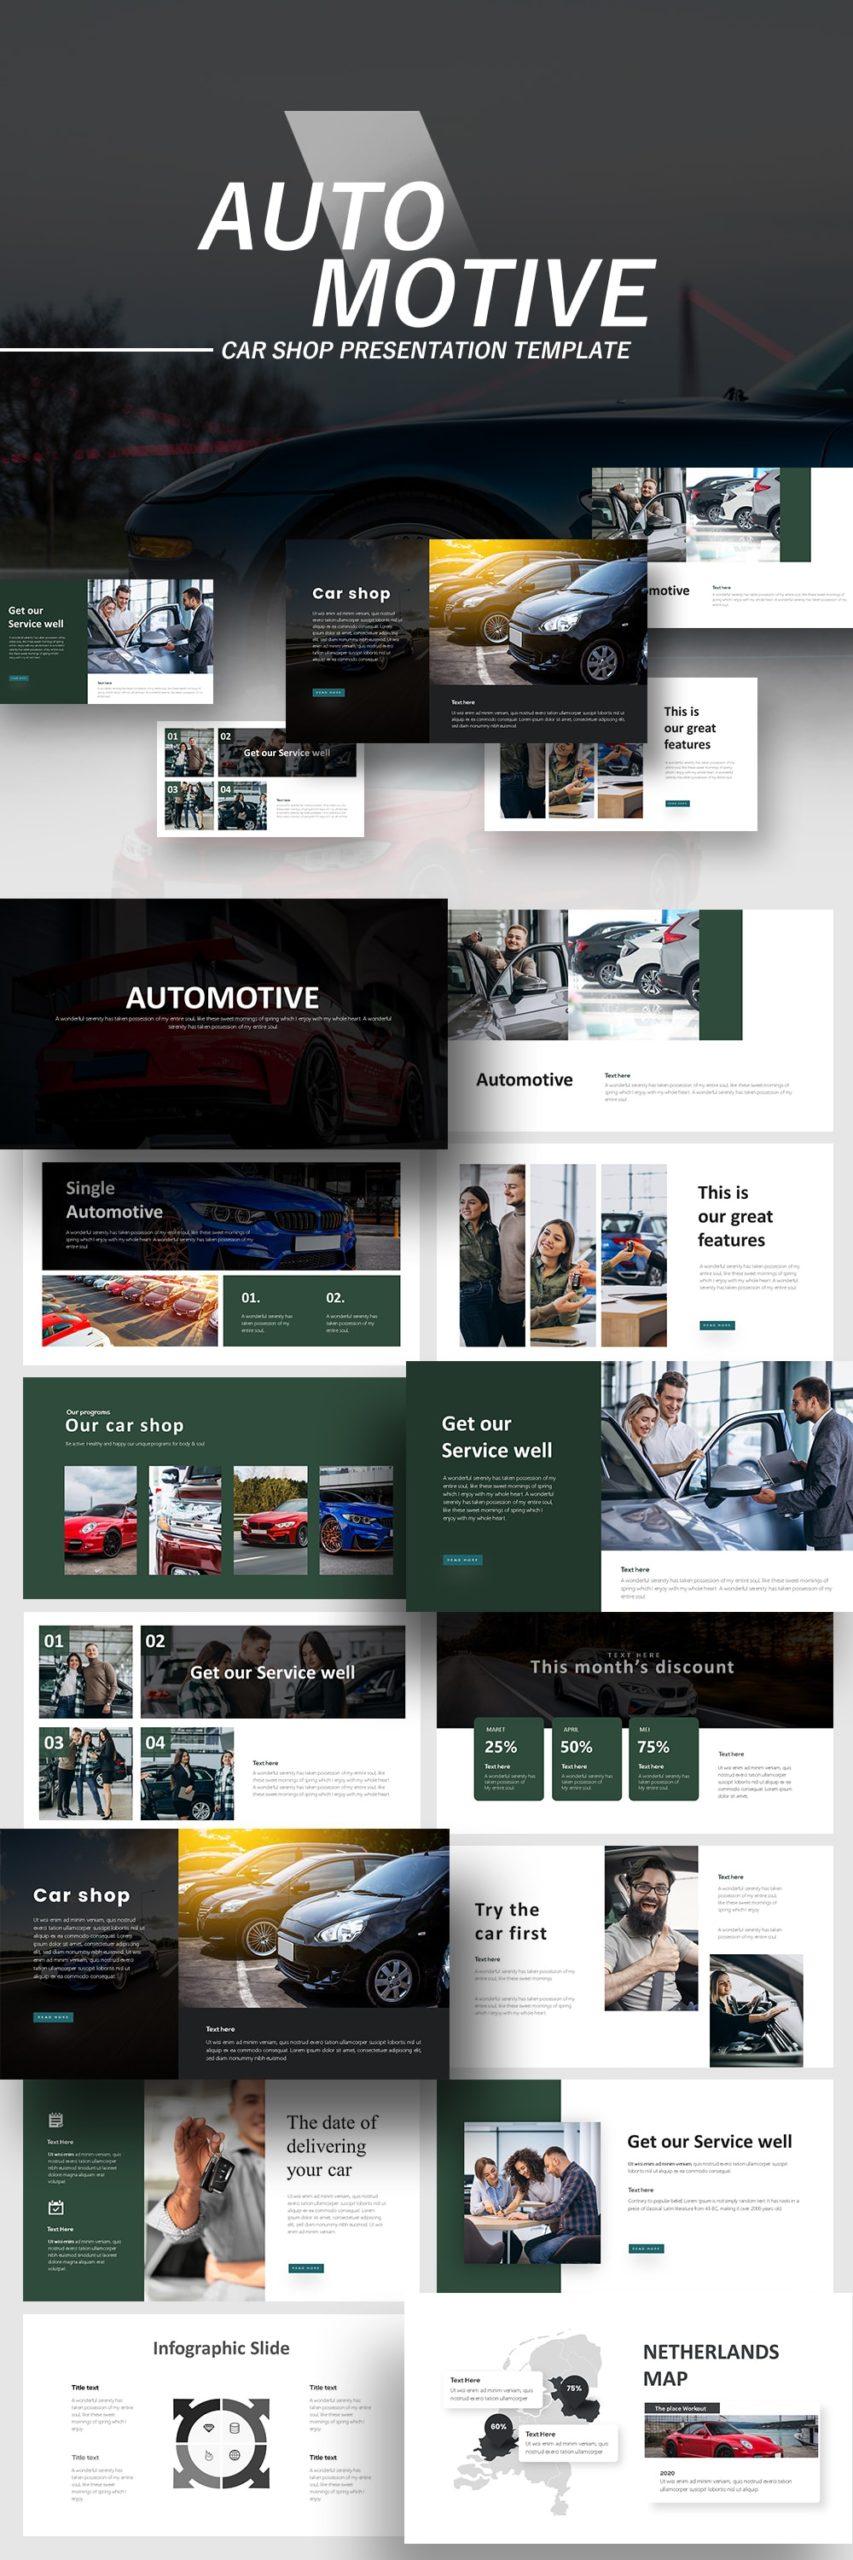 Free Automotive PowerPoint